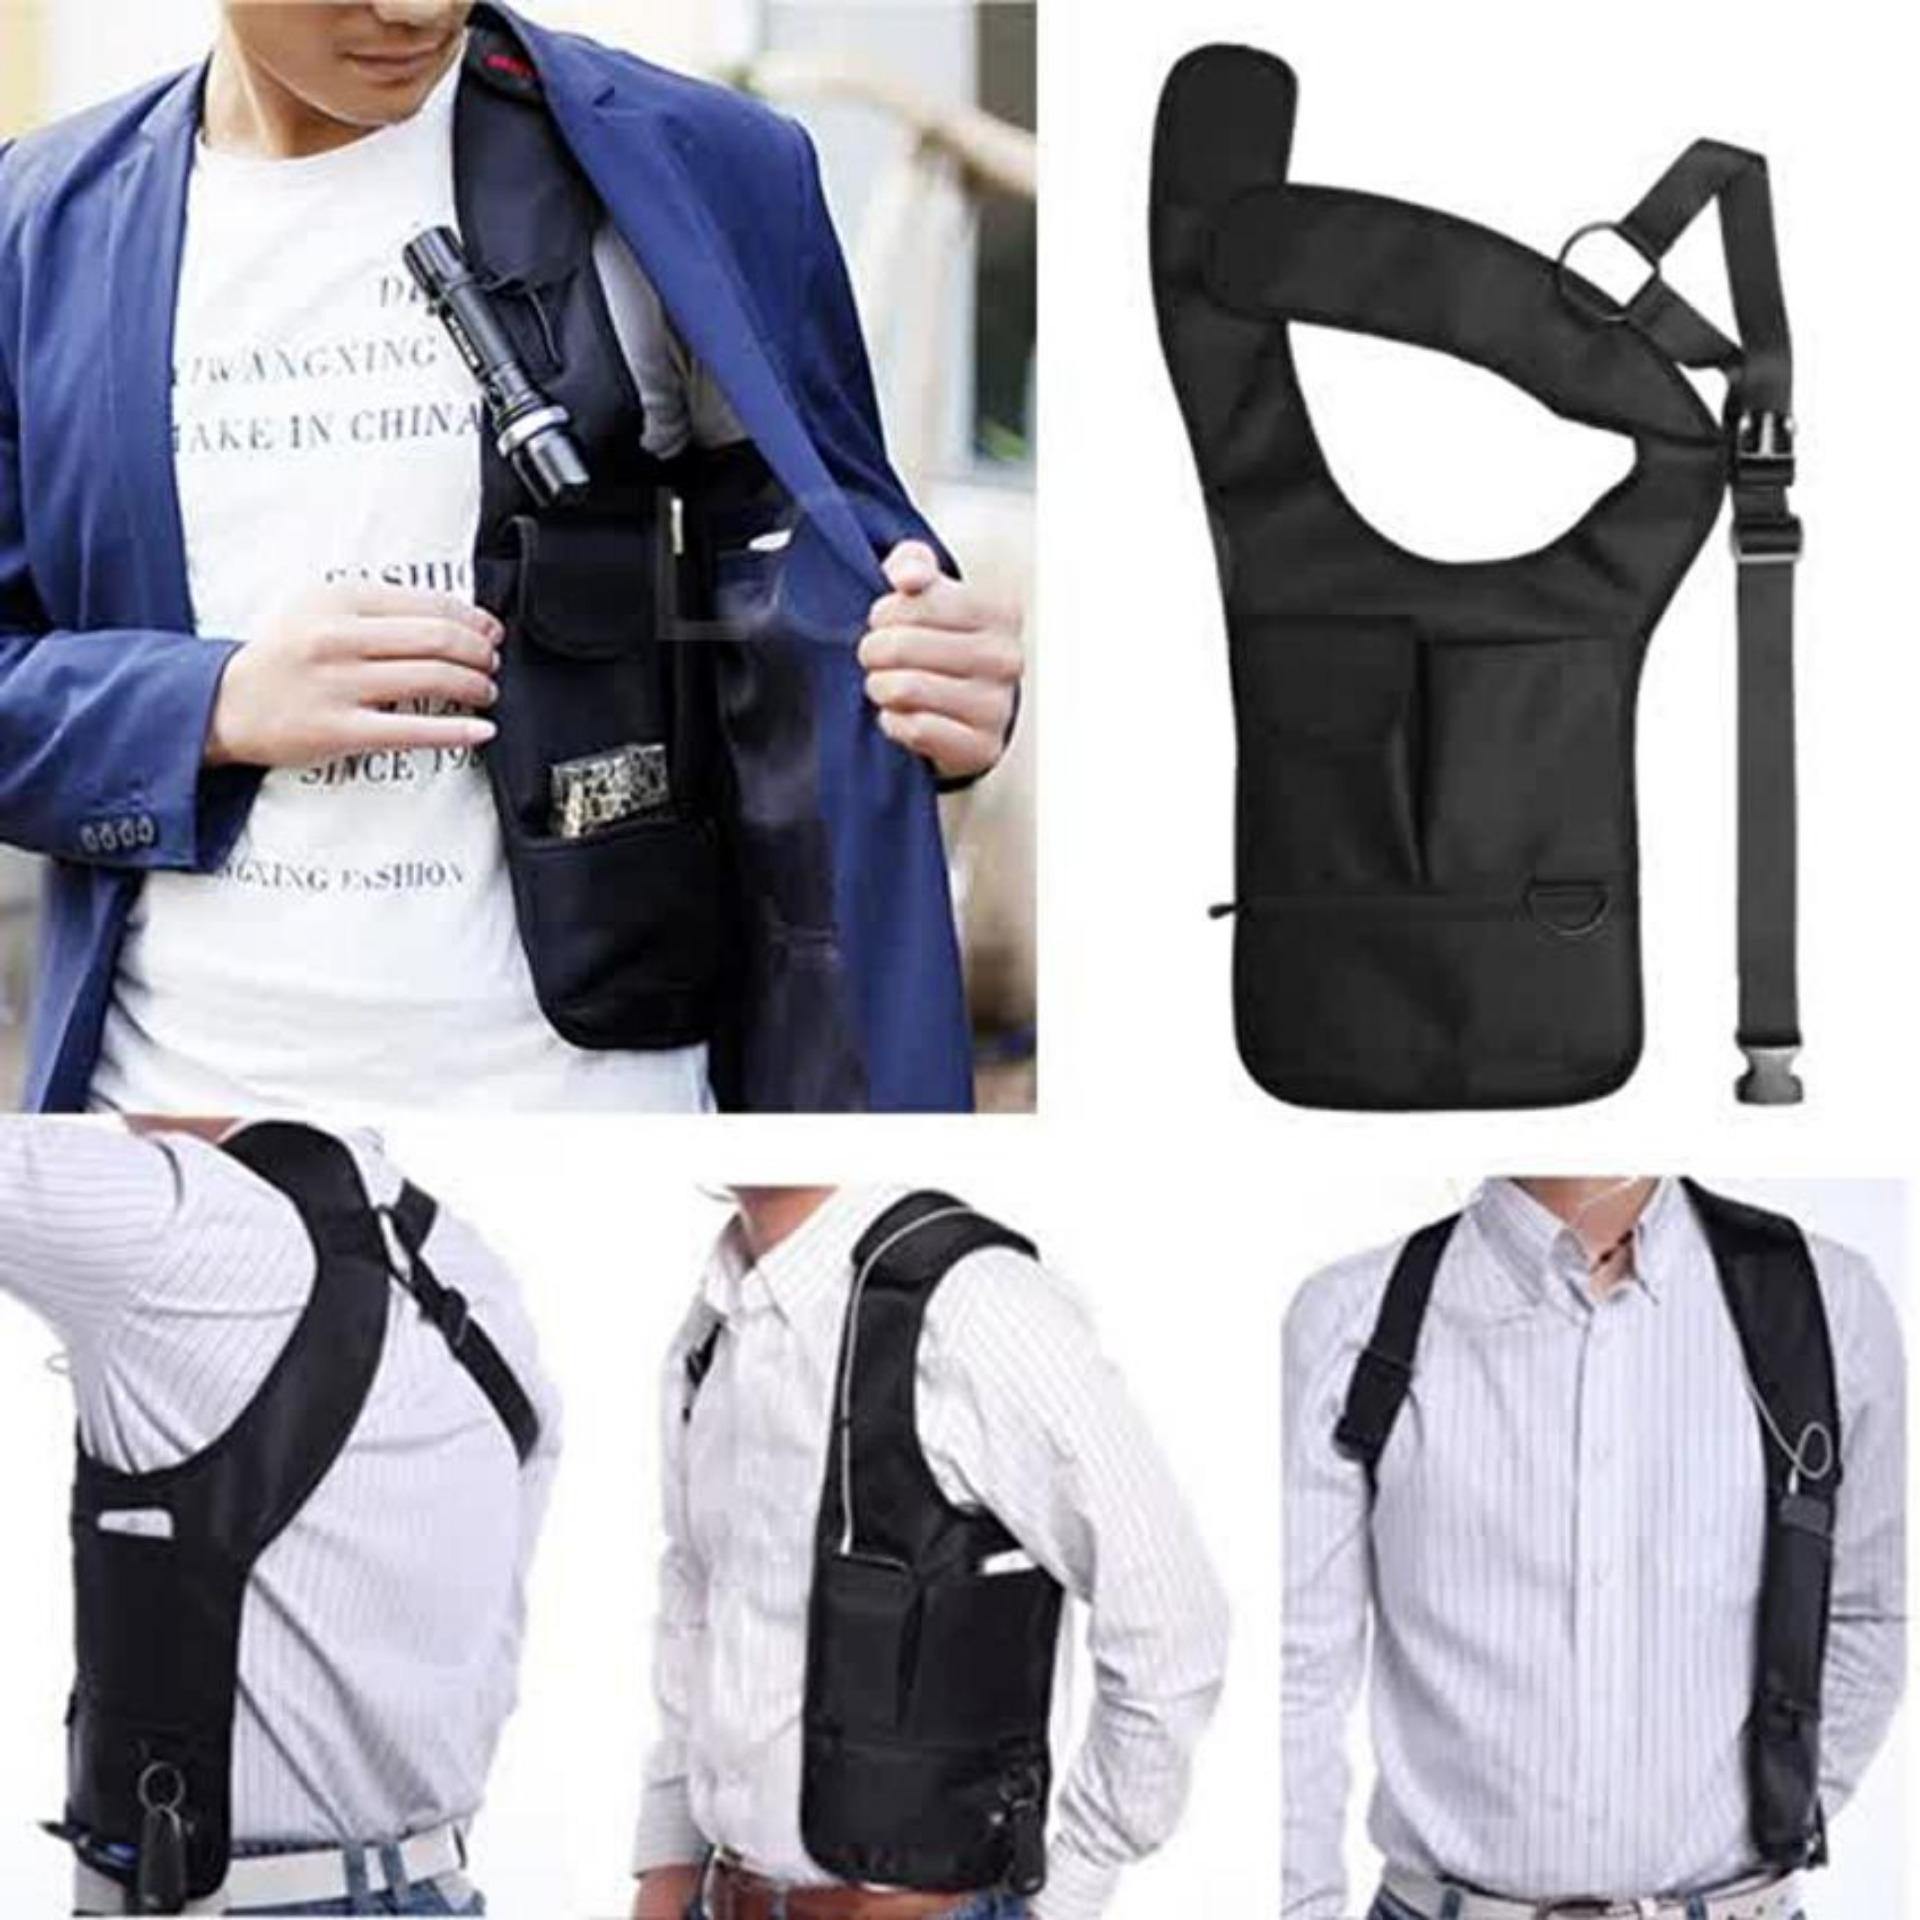 Cek Harga Baru Premium Quality Tas Ransel Smart Backpack Anti Thief Uneed Capsule Maling Ub104 Black Gadget Pundak Shoulder Bag Hitam